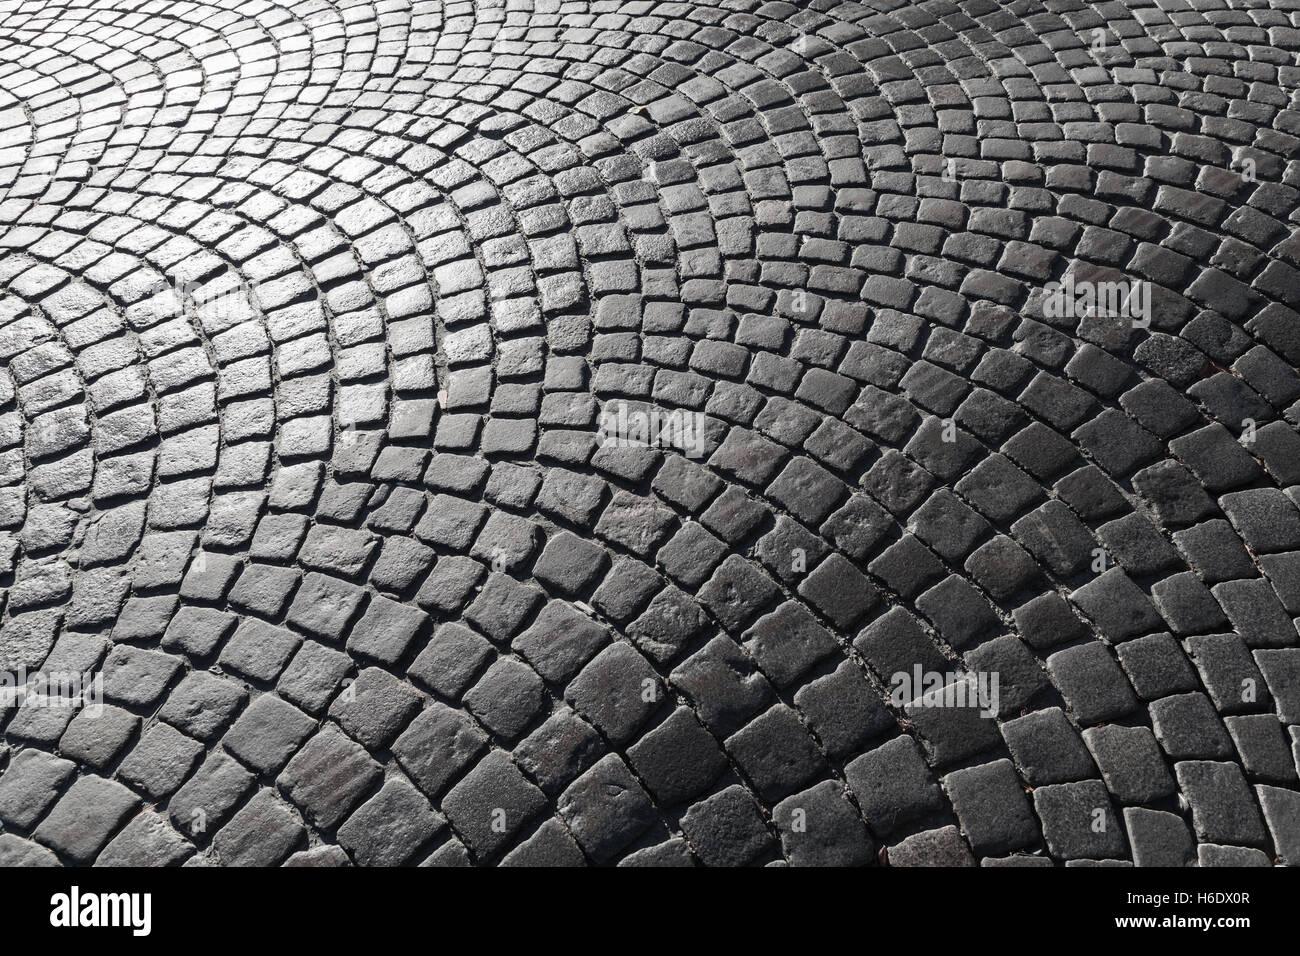 Dark Shiny Cobble Road Stone Street Pavement Pattern